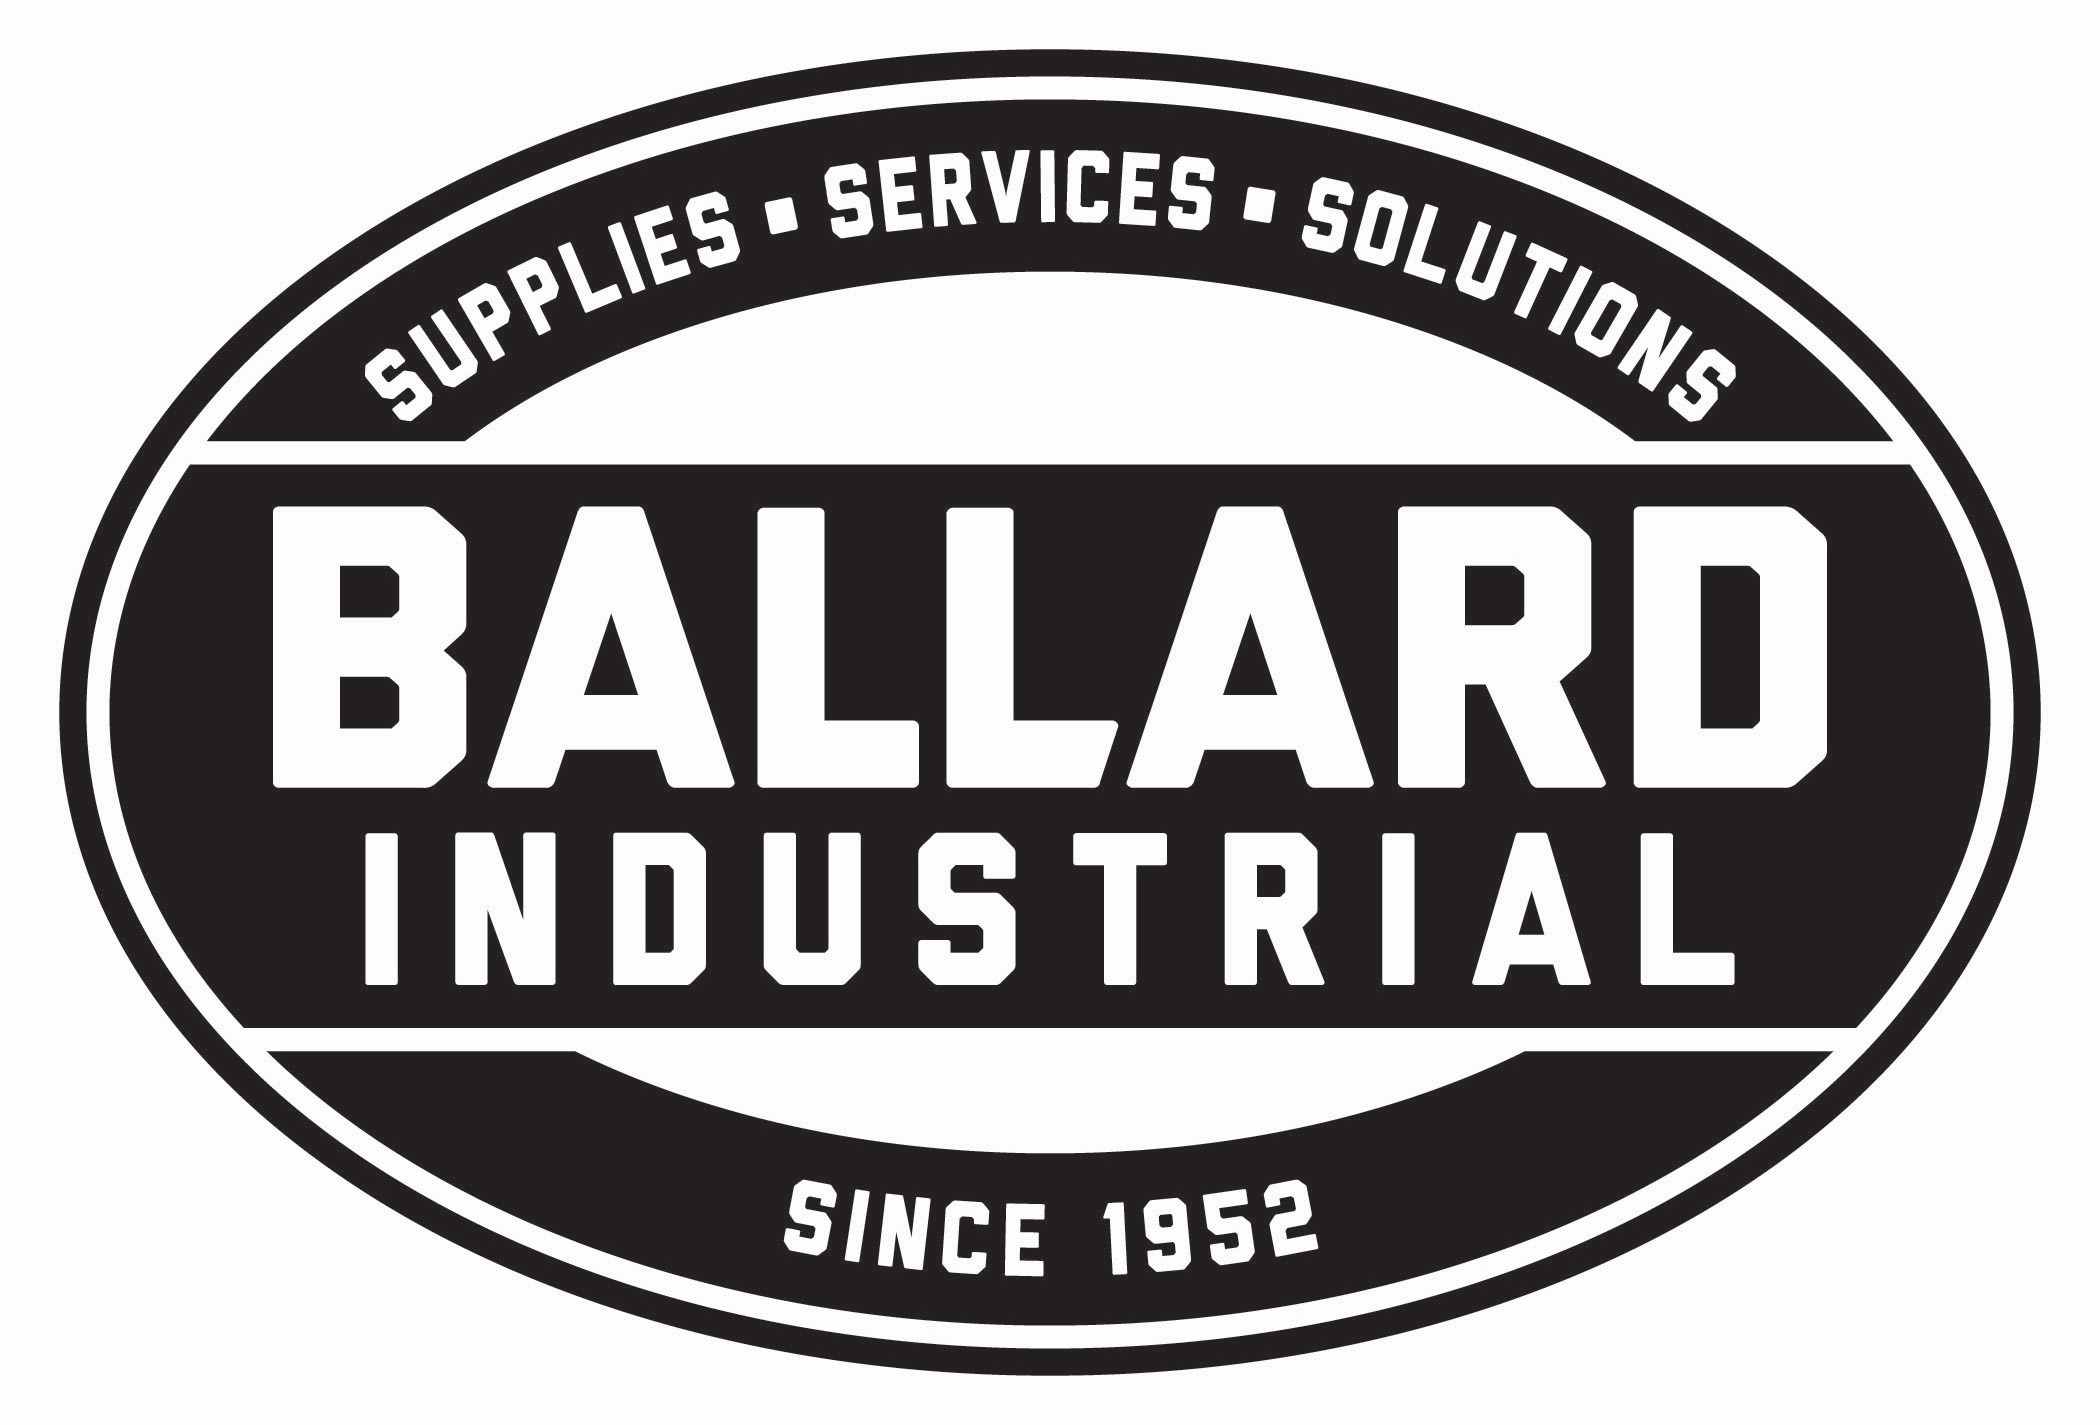 Ballard_Industrial_Logo.jpg